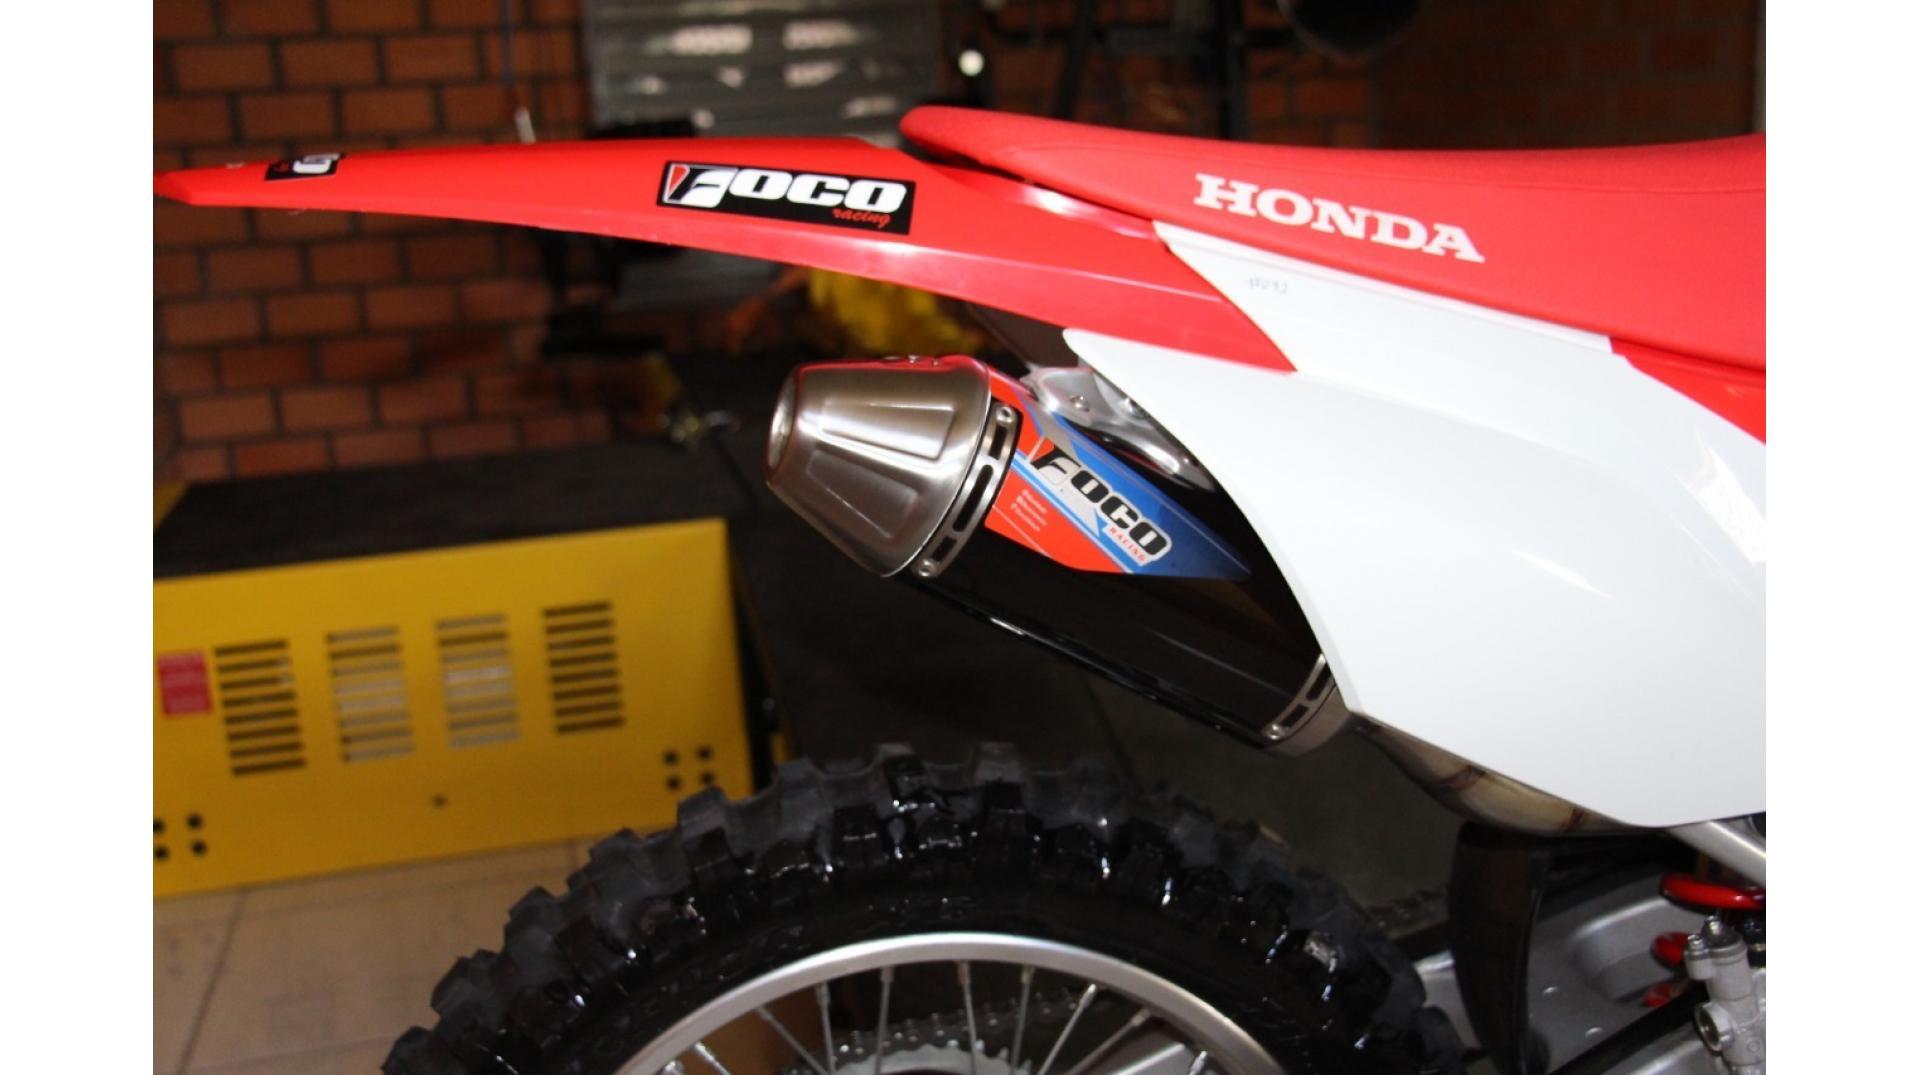 Escapamento Foco Racing CRF250F Strong - Curva + Ponteira